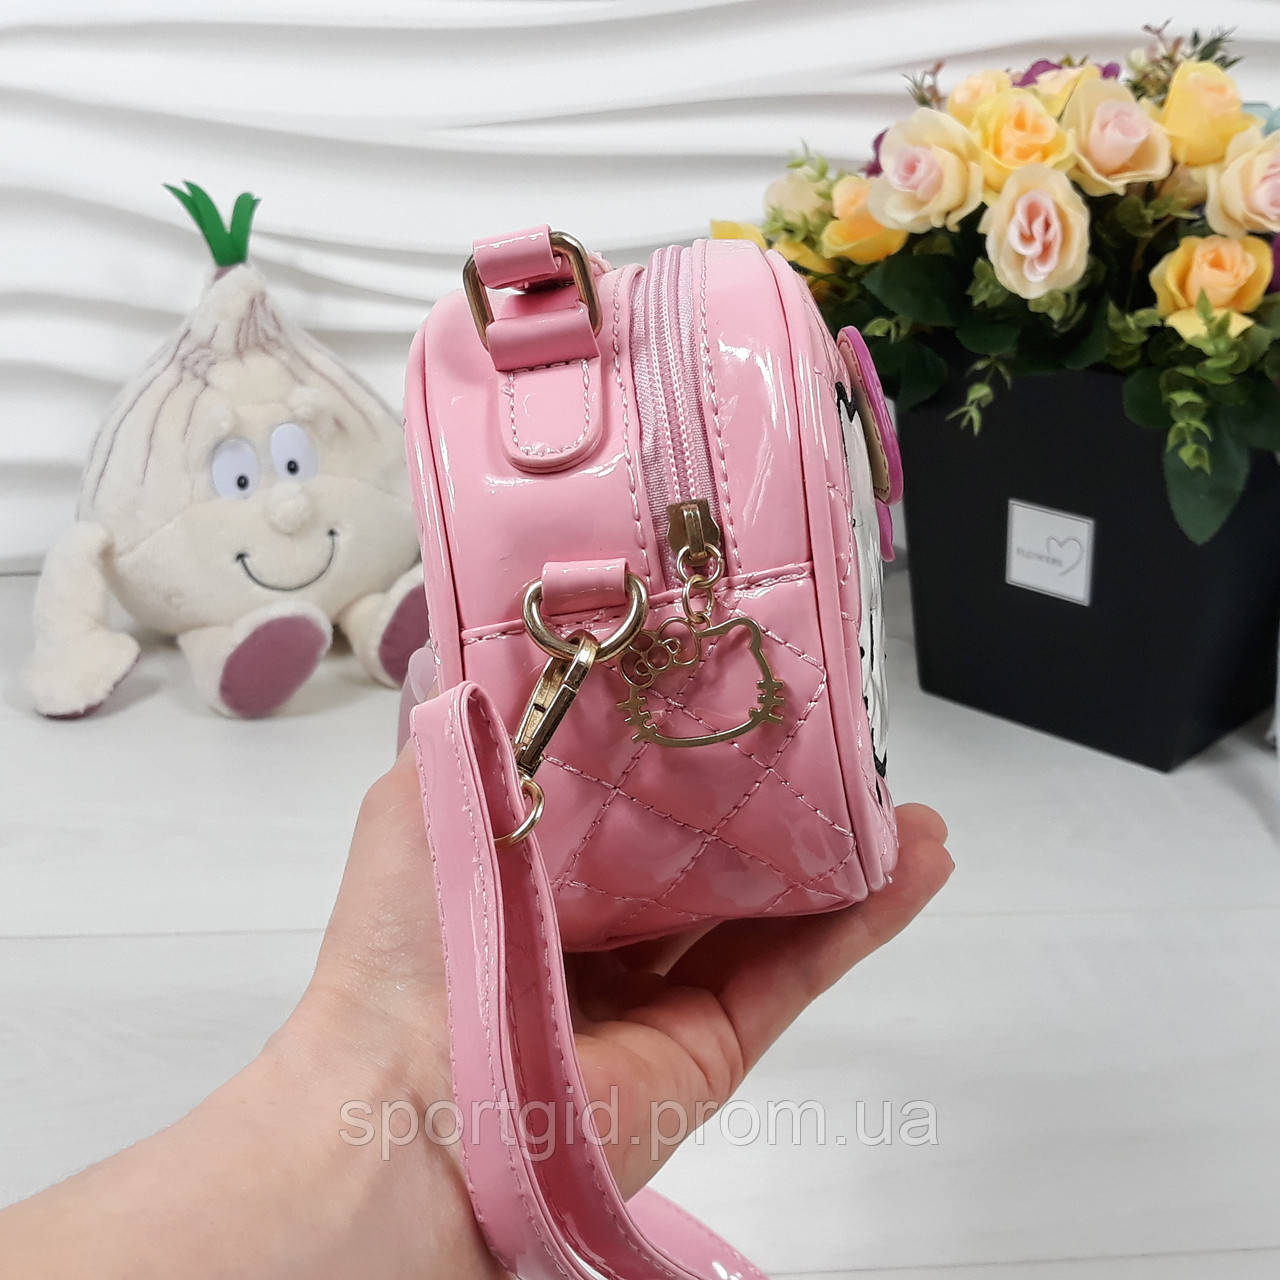 7d090728c49c Стильная детская сумочка Hello Kitty для девочки: продажа, цена в ...